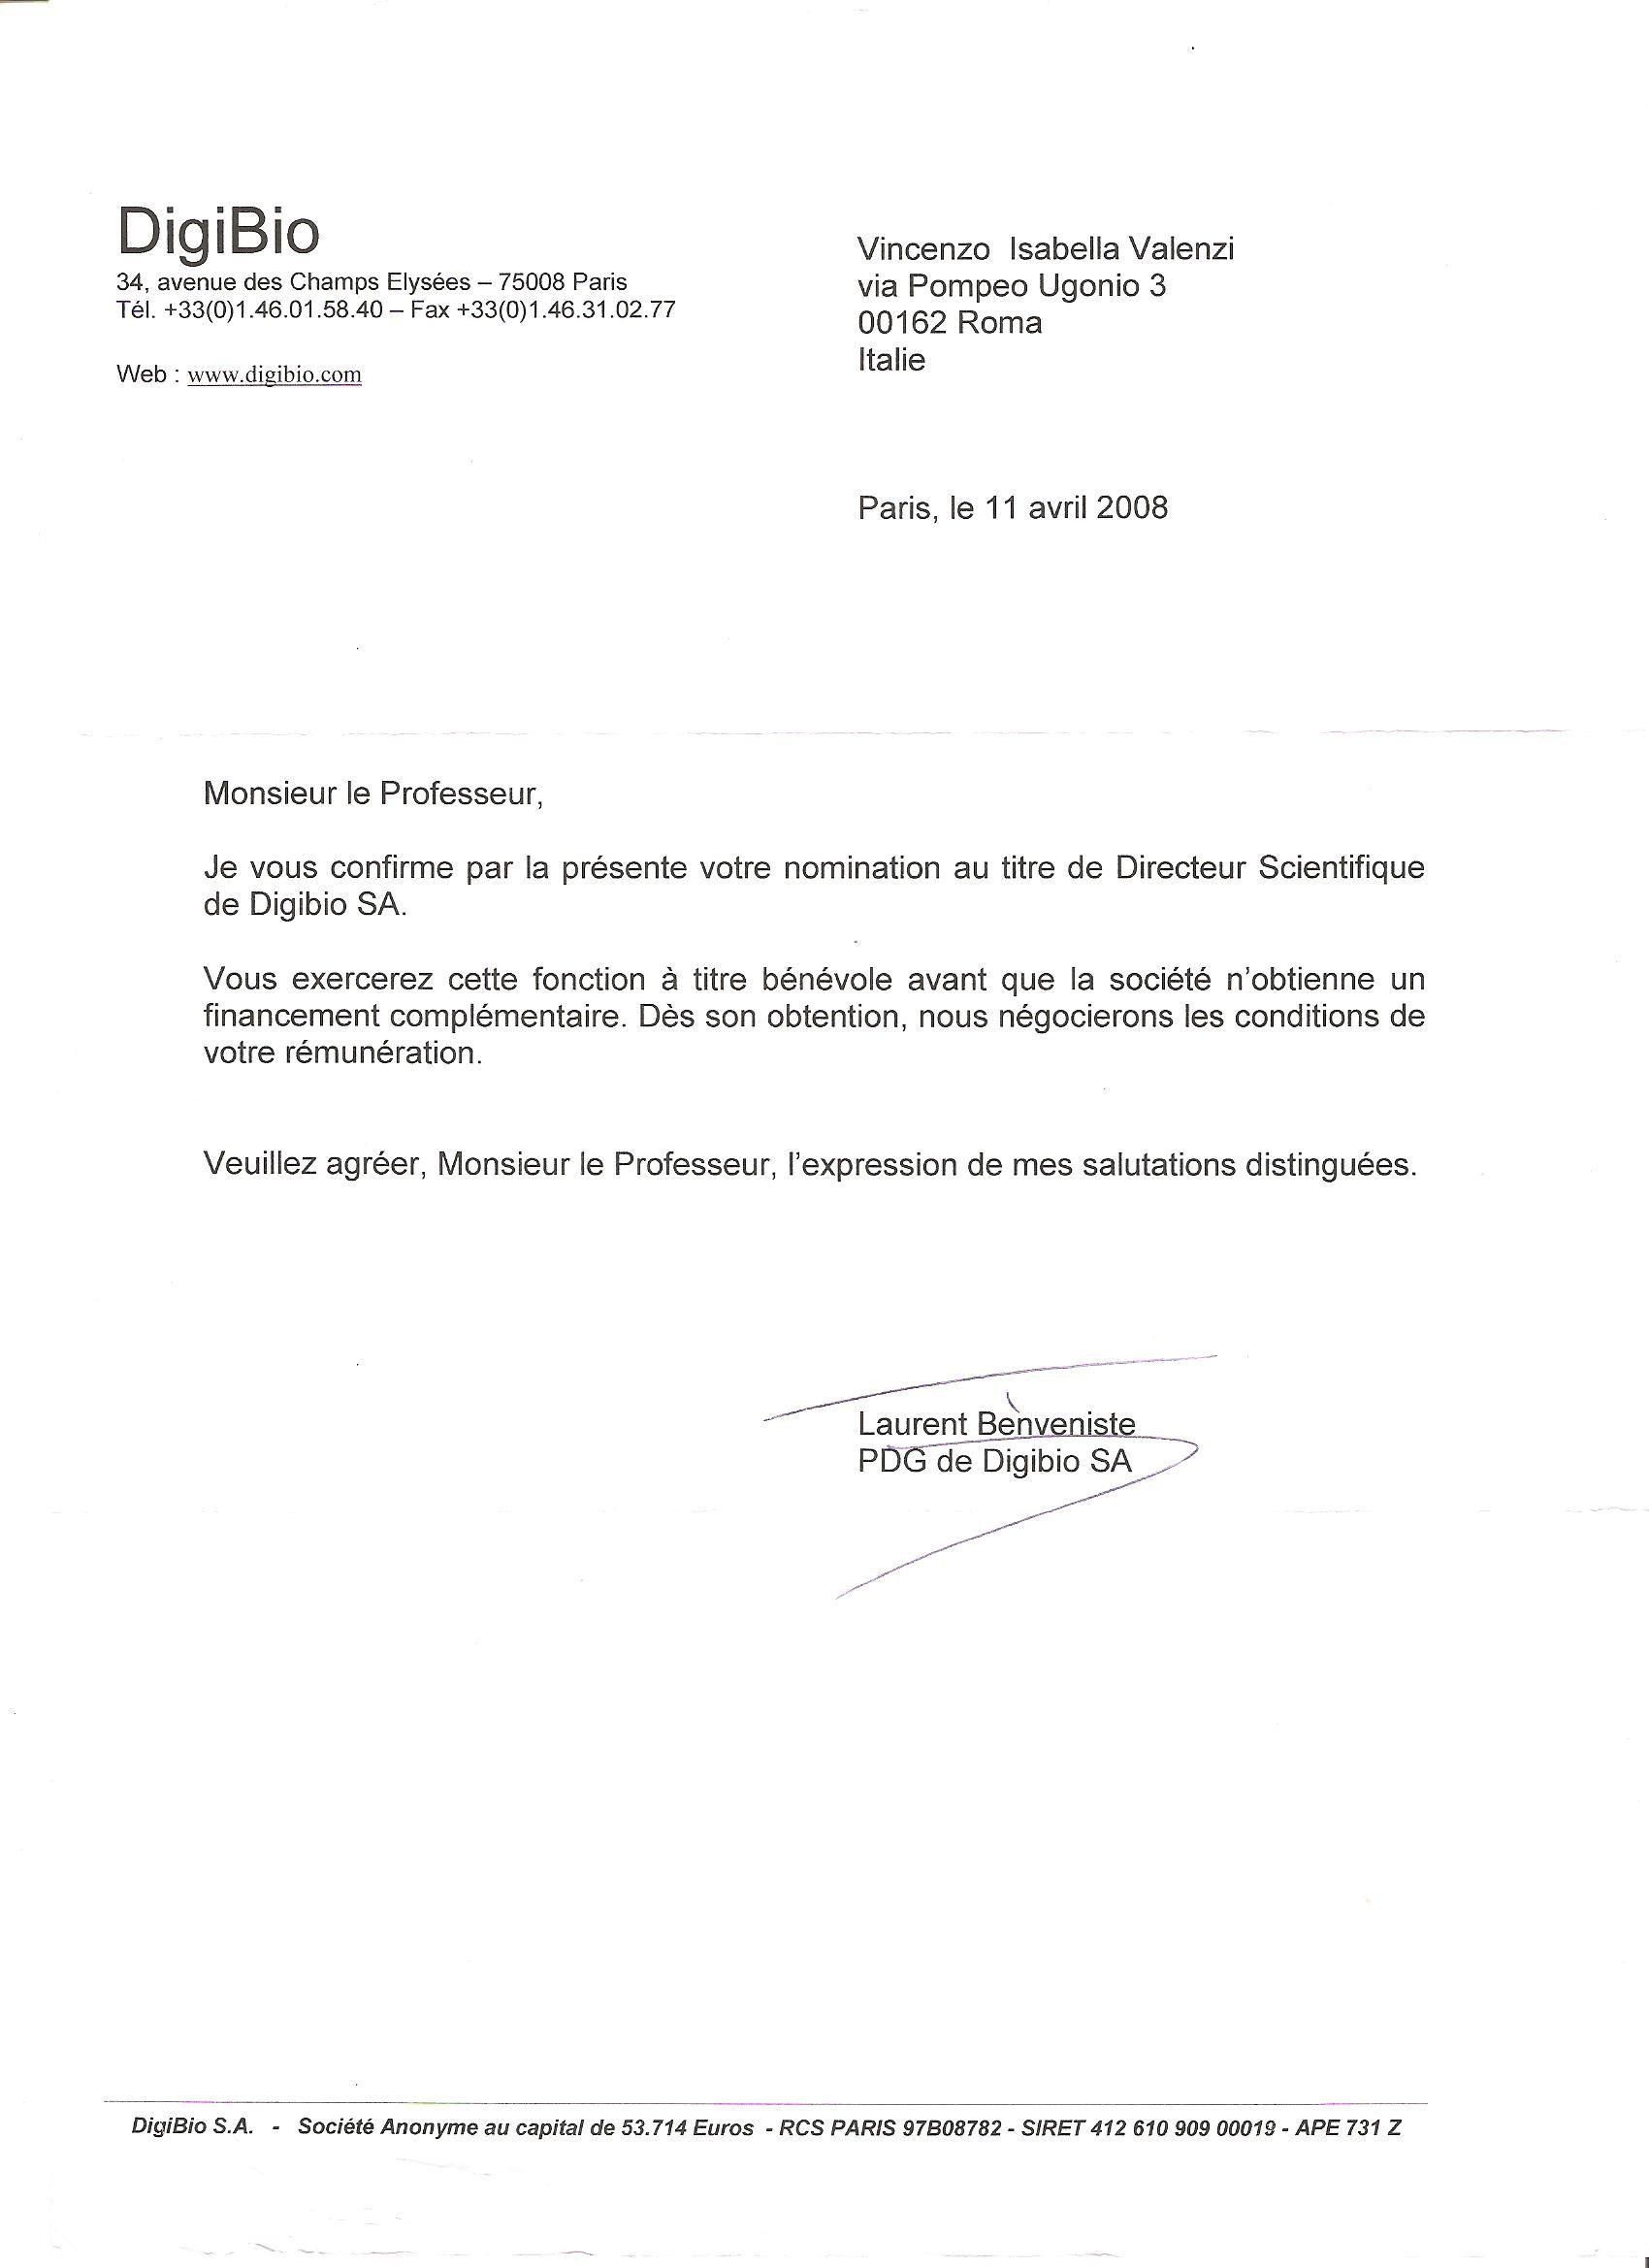 Extended Car Warranty Cancellation Letter Template - Appointment Letter Template Images Appointment Letter